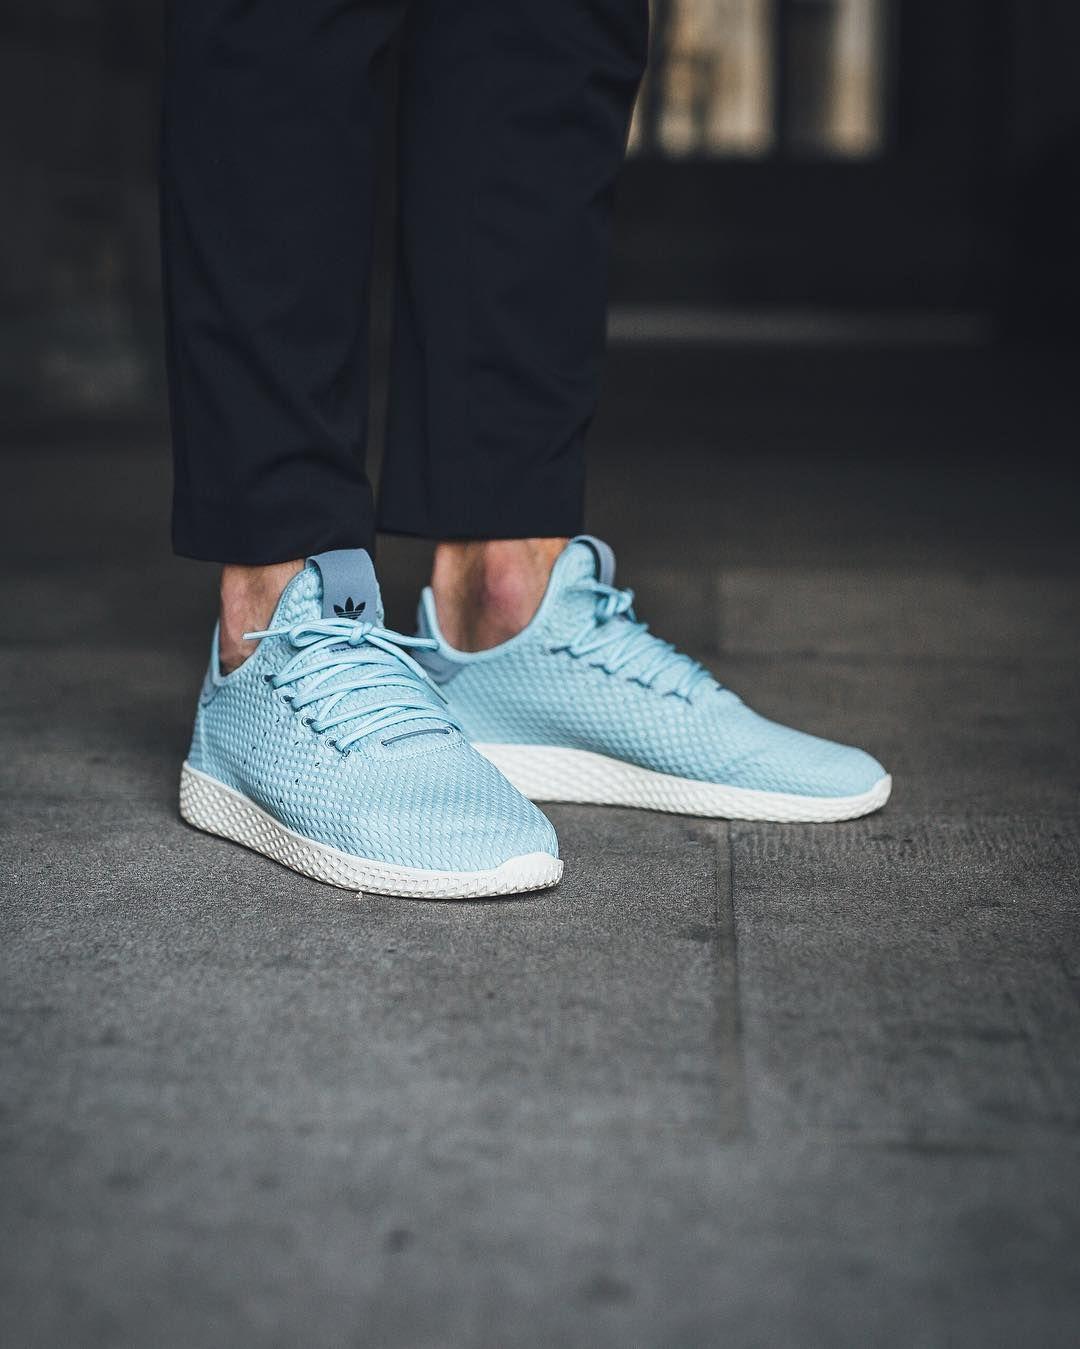 Pharrell Williams X Adidas Tennis Hu Icey Blue Mens Boots Fashion Nice Shoes Adidas Pharrell Williams